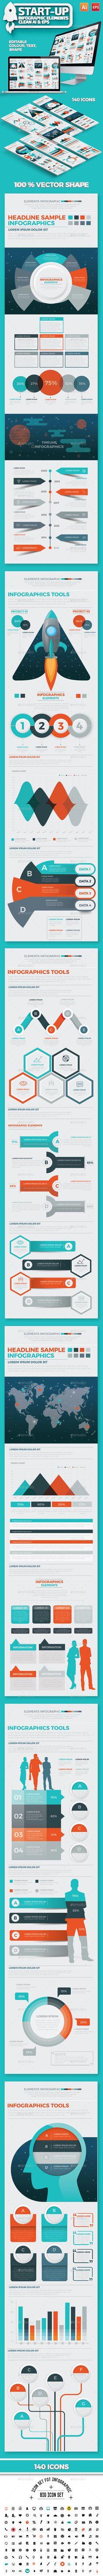 Start Up Infographic Design Template Vector EPS, AI Illustrator